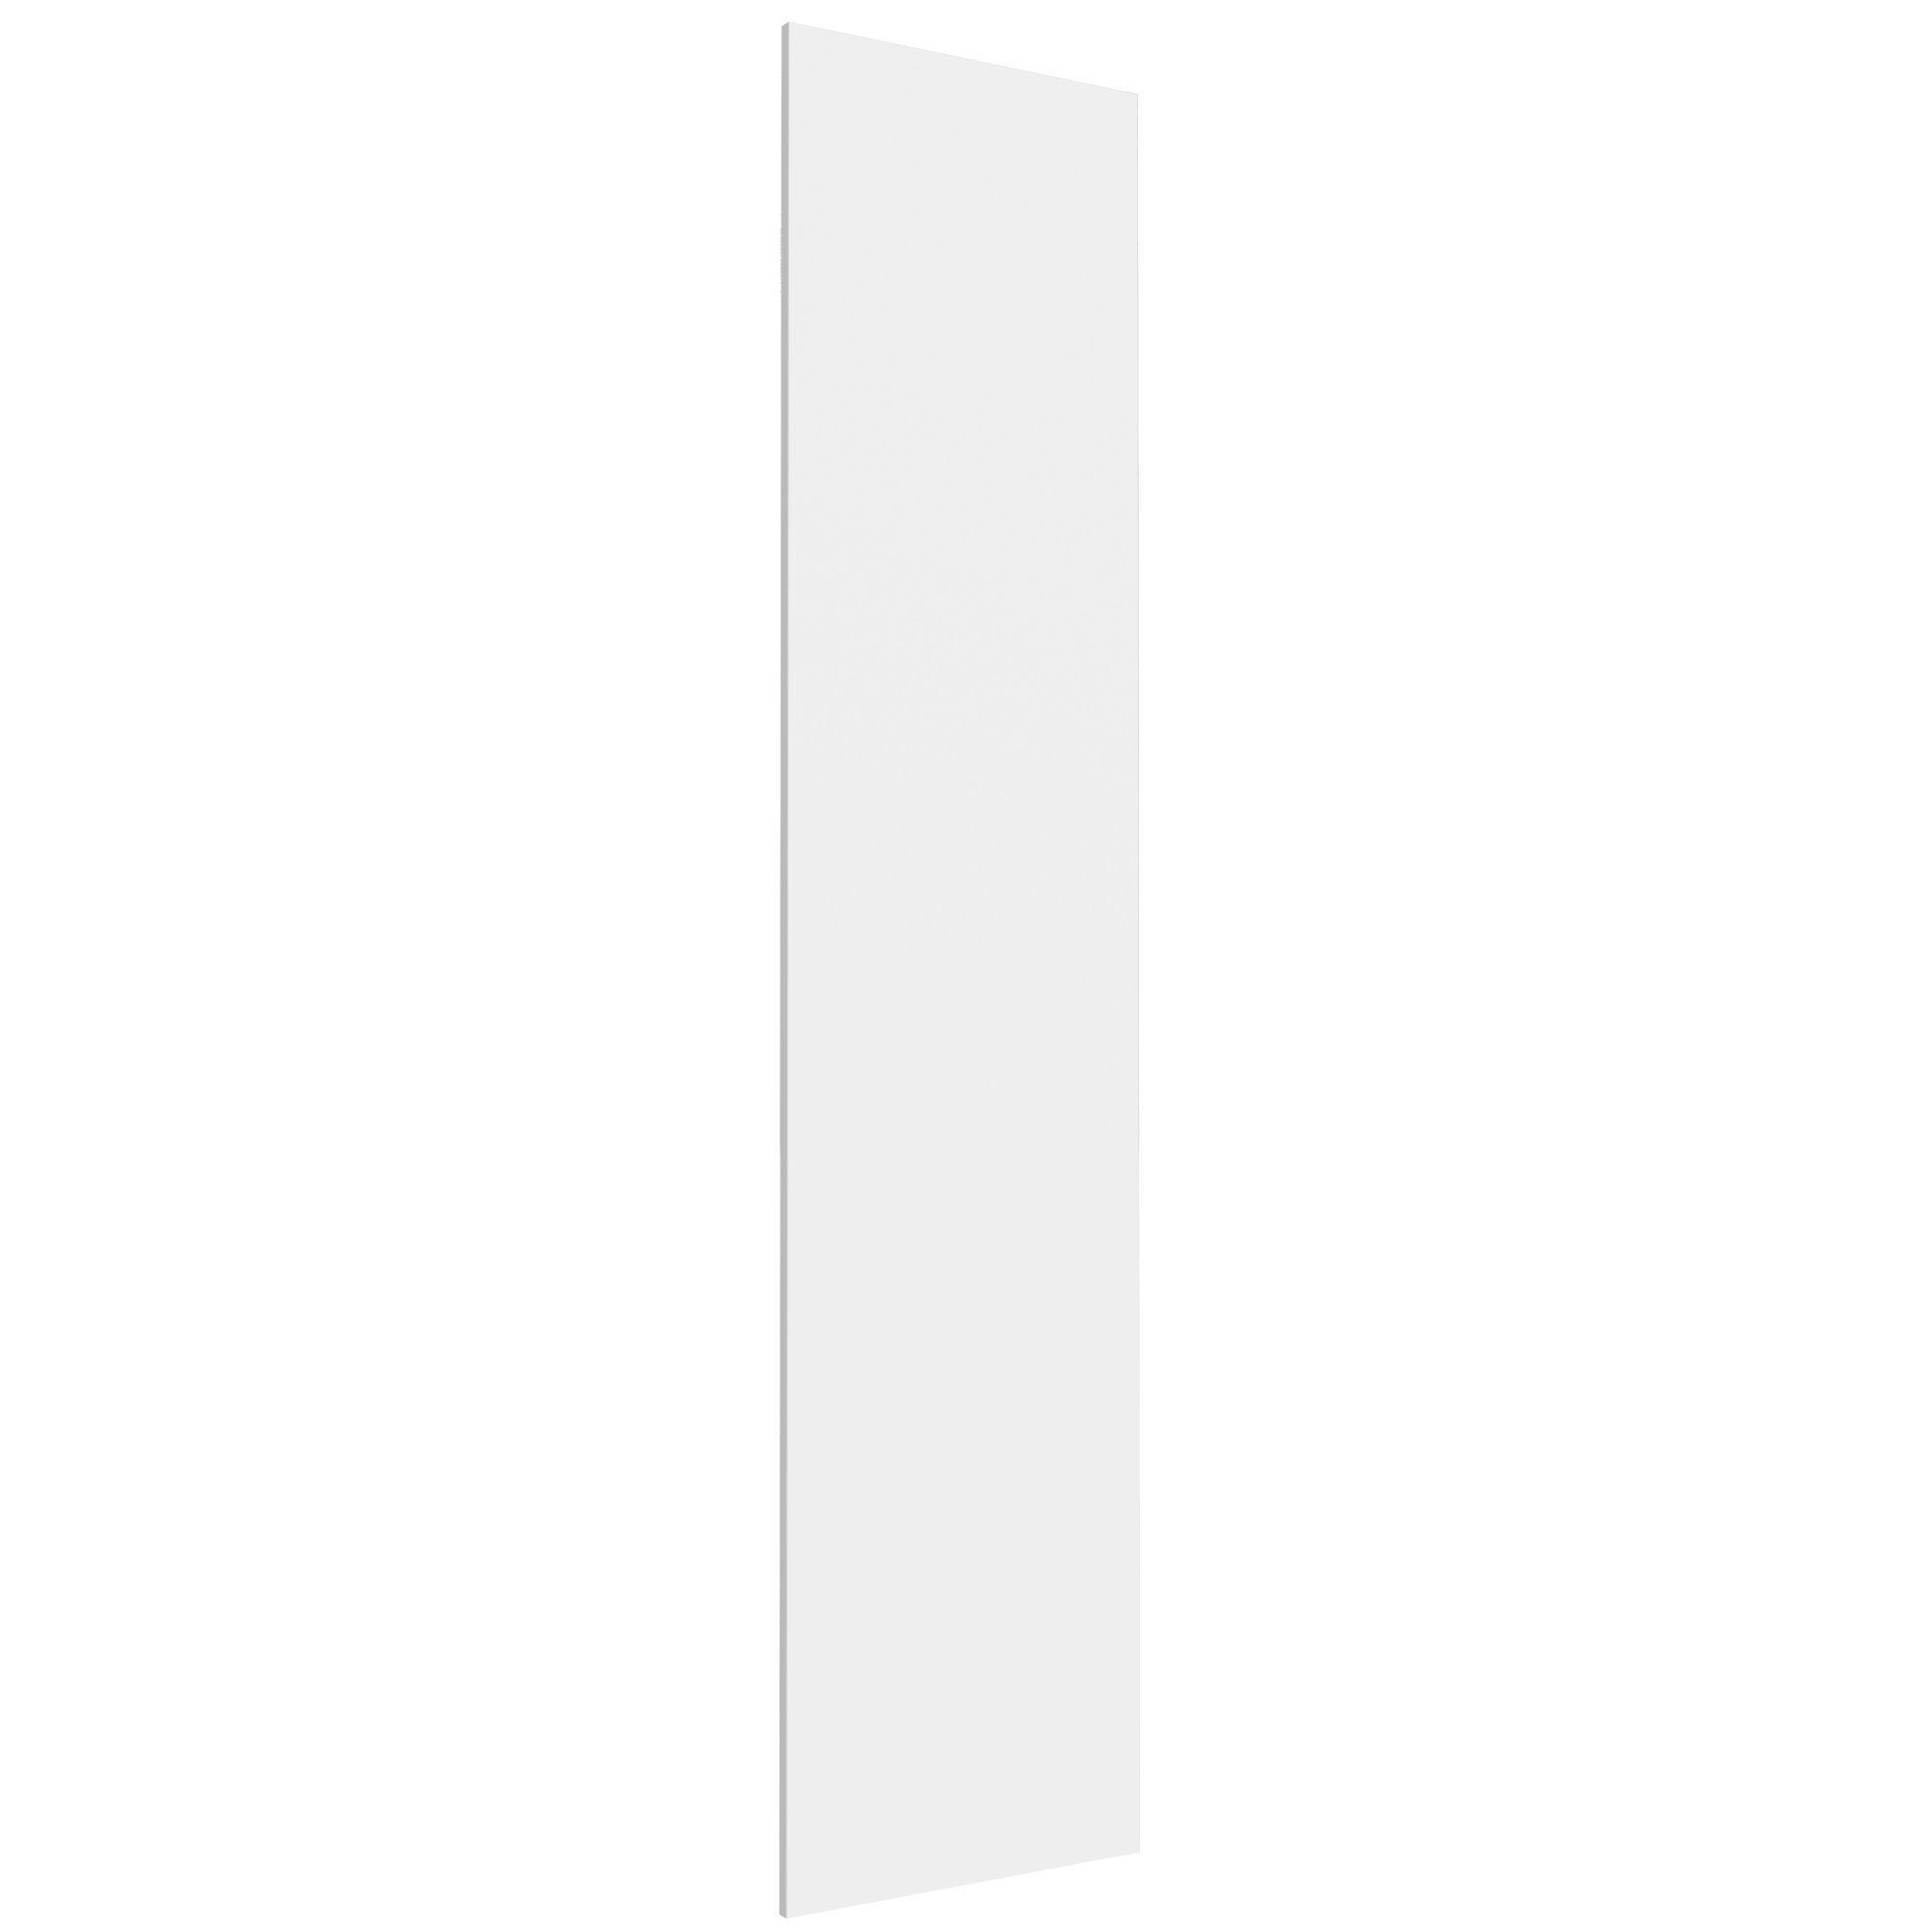 Darwin Modular White & Matt Tall Wardrobe Door (h)2288mm (w)497mm (d)16mm